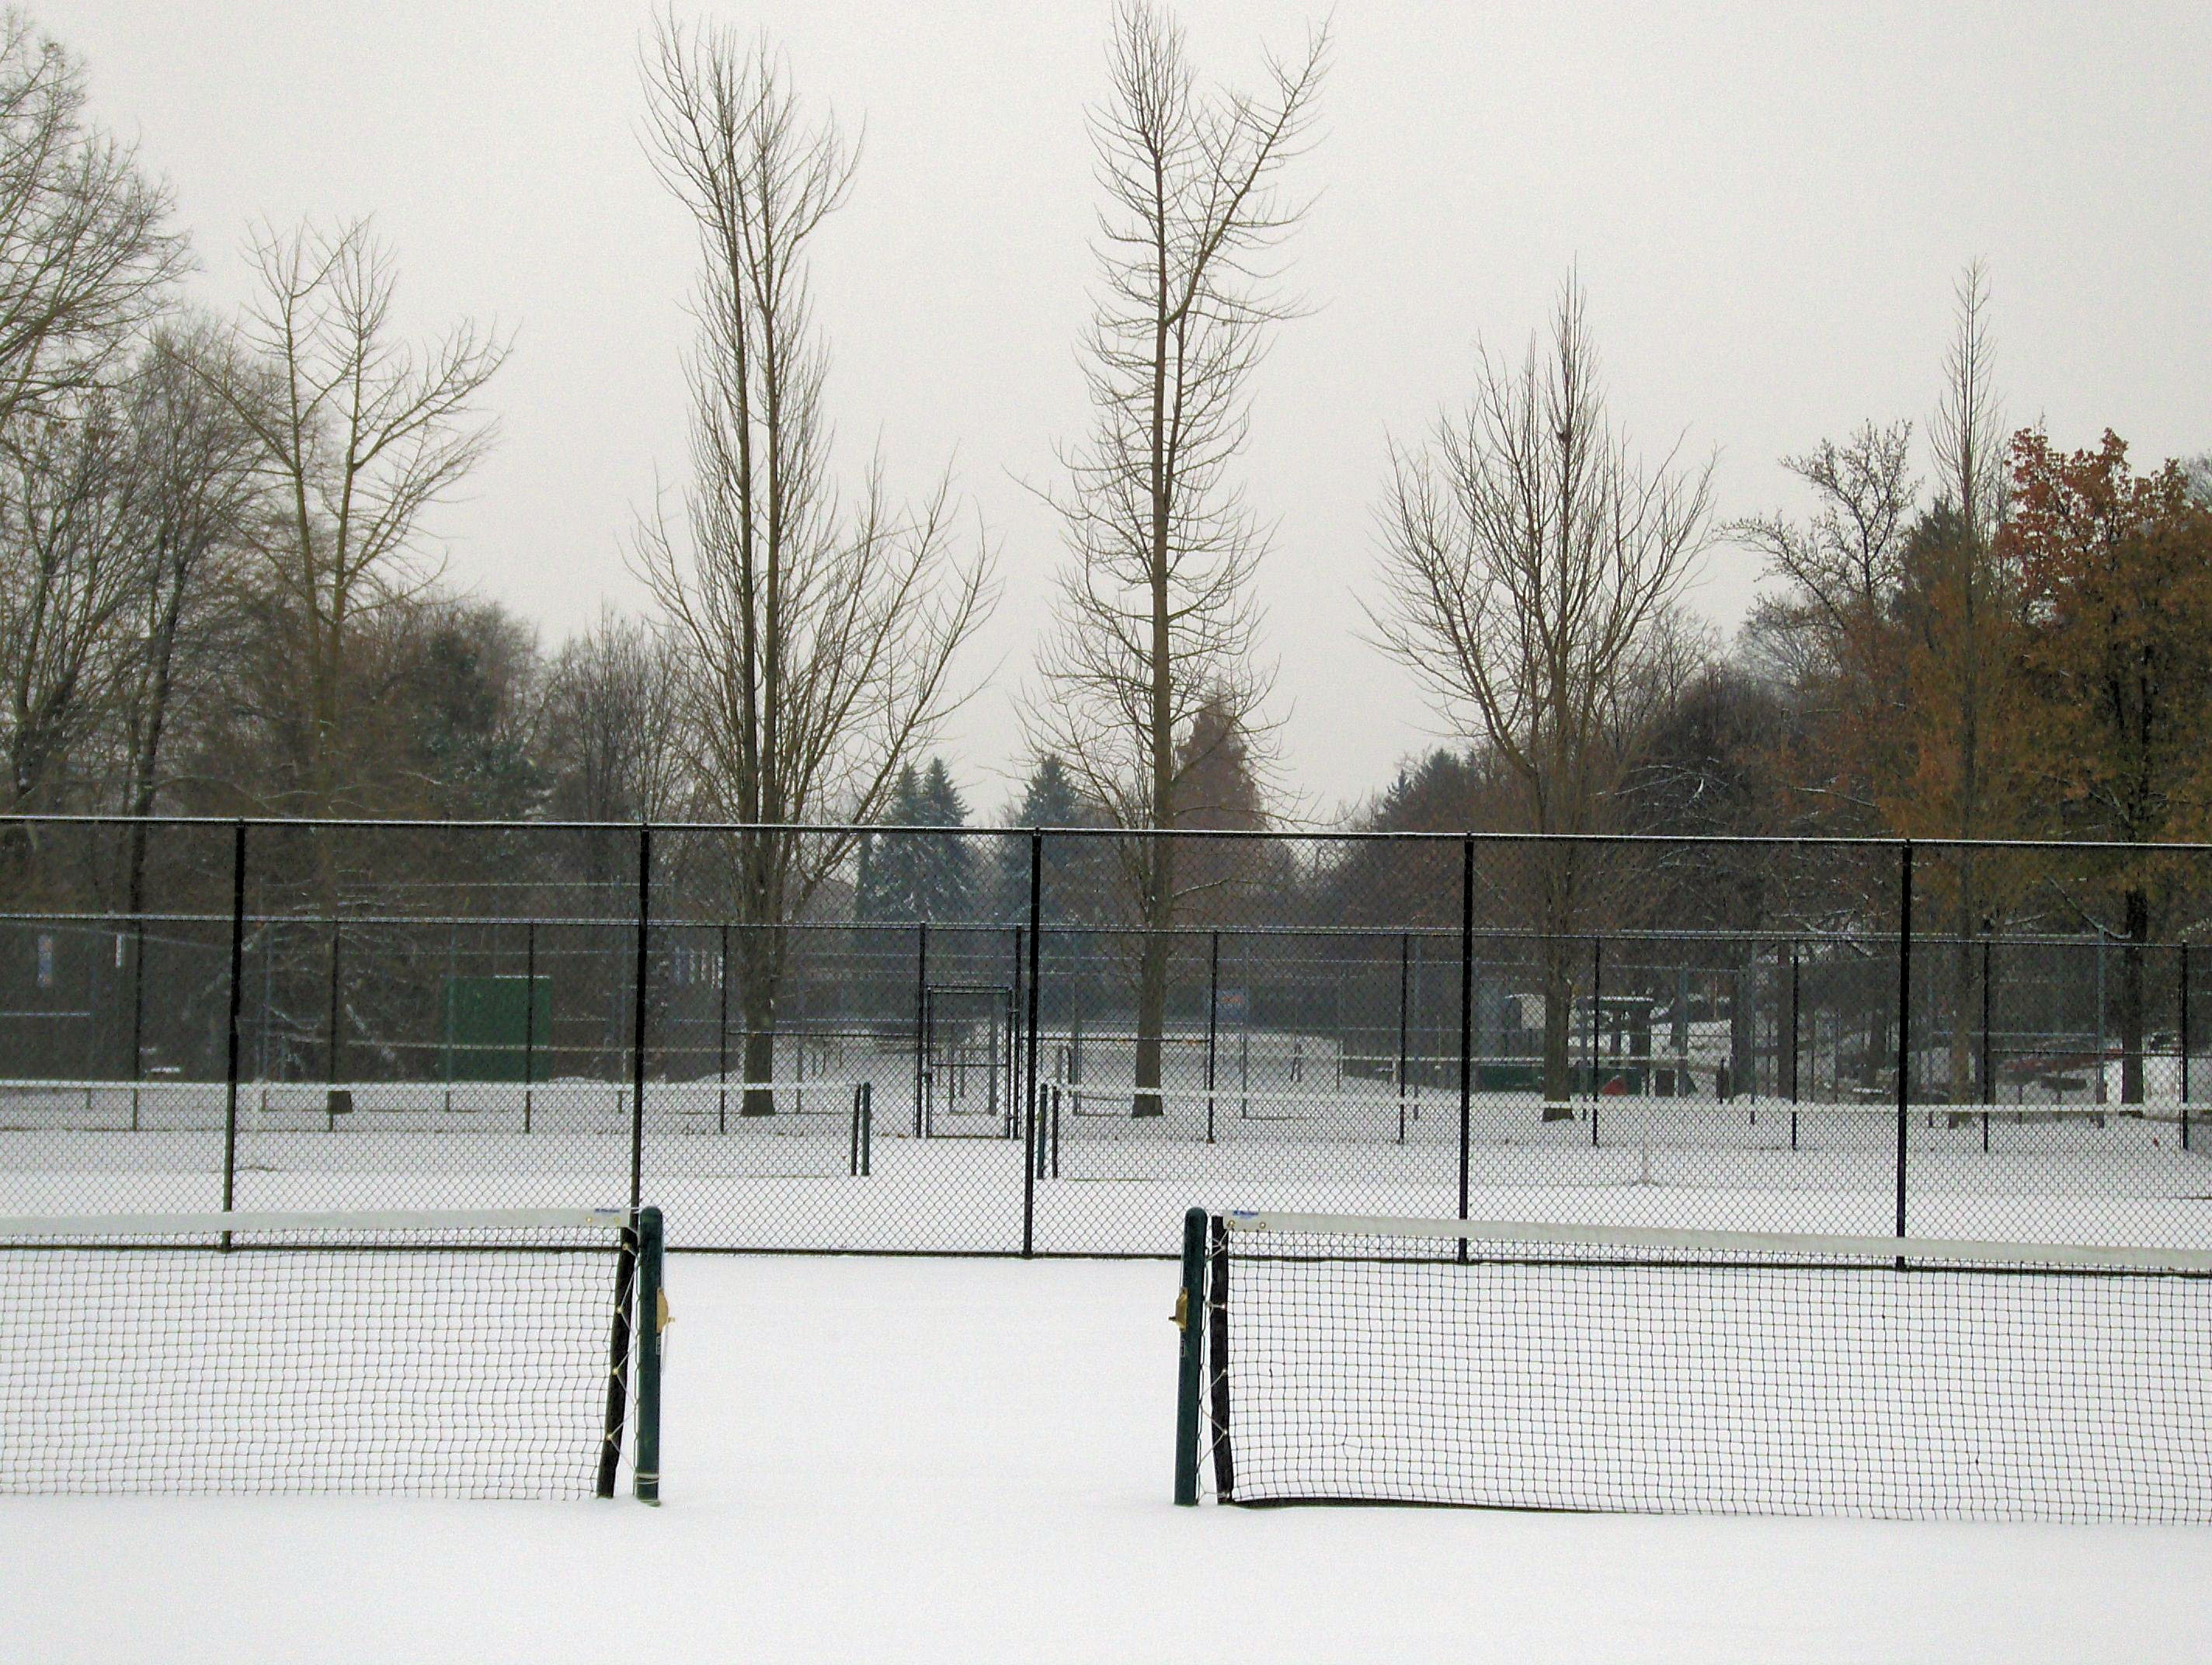 highland park winter courts